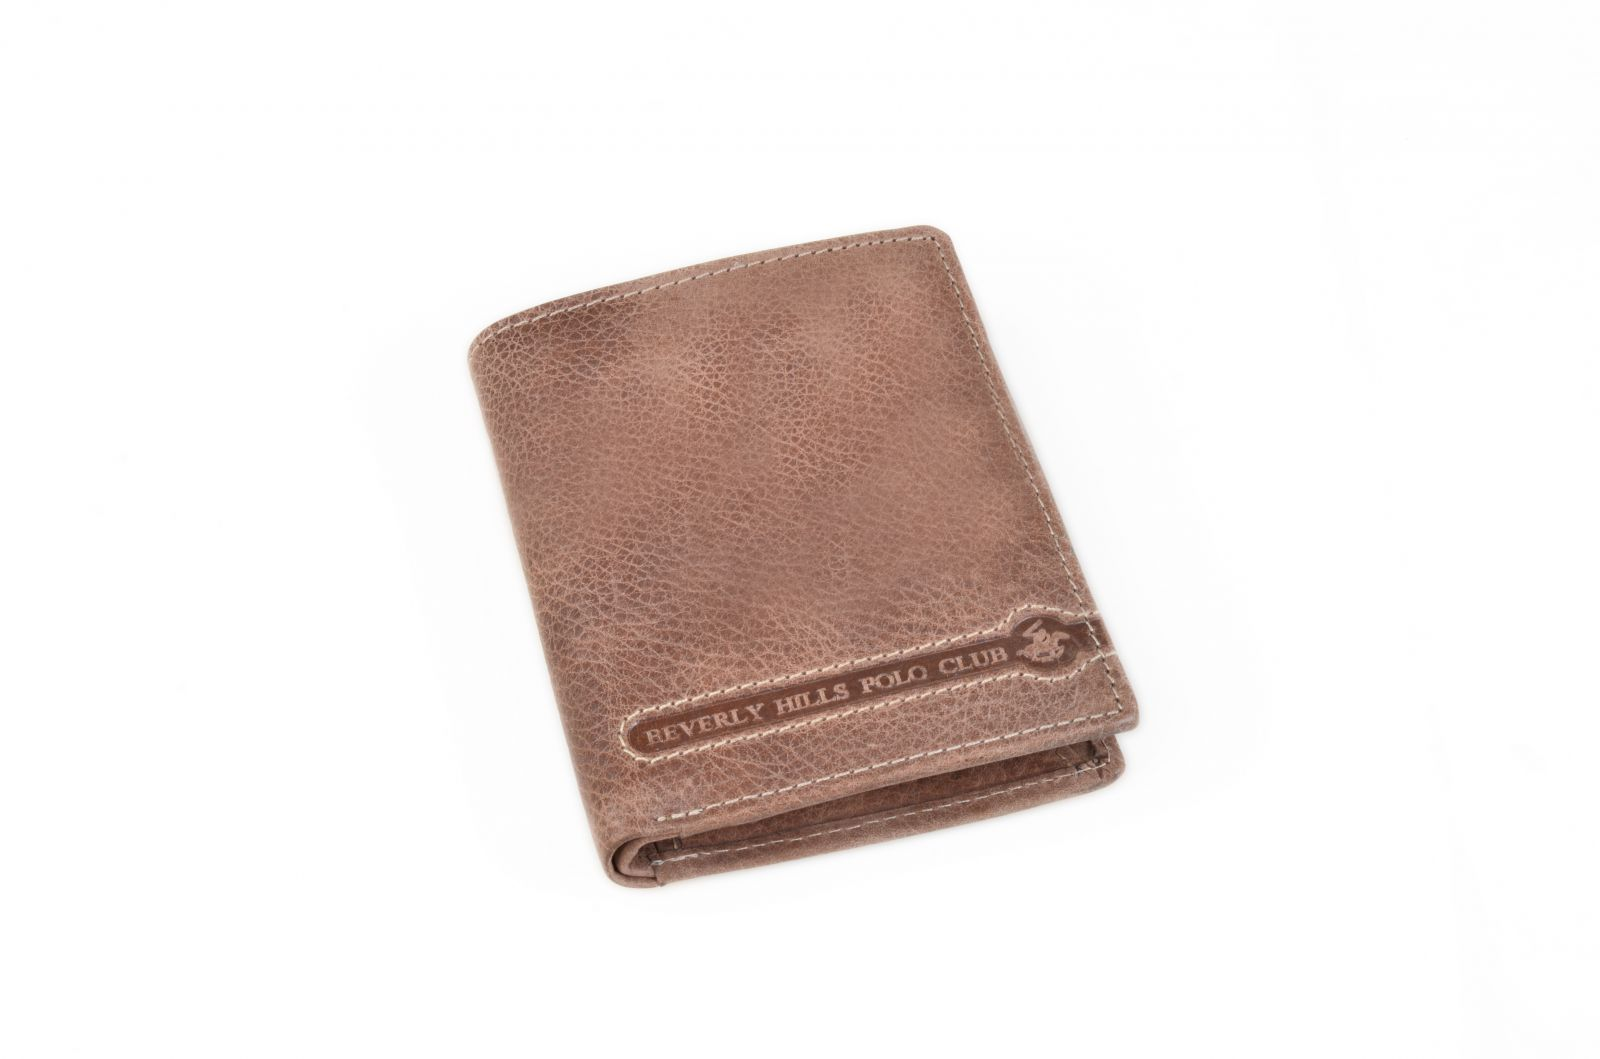 Peněženka pánská BHPC Tucson BH-396-25 hnědá v krabičce